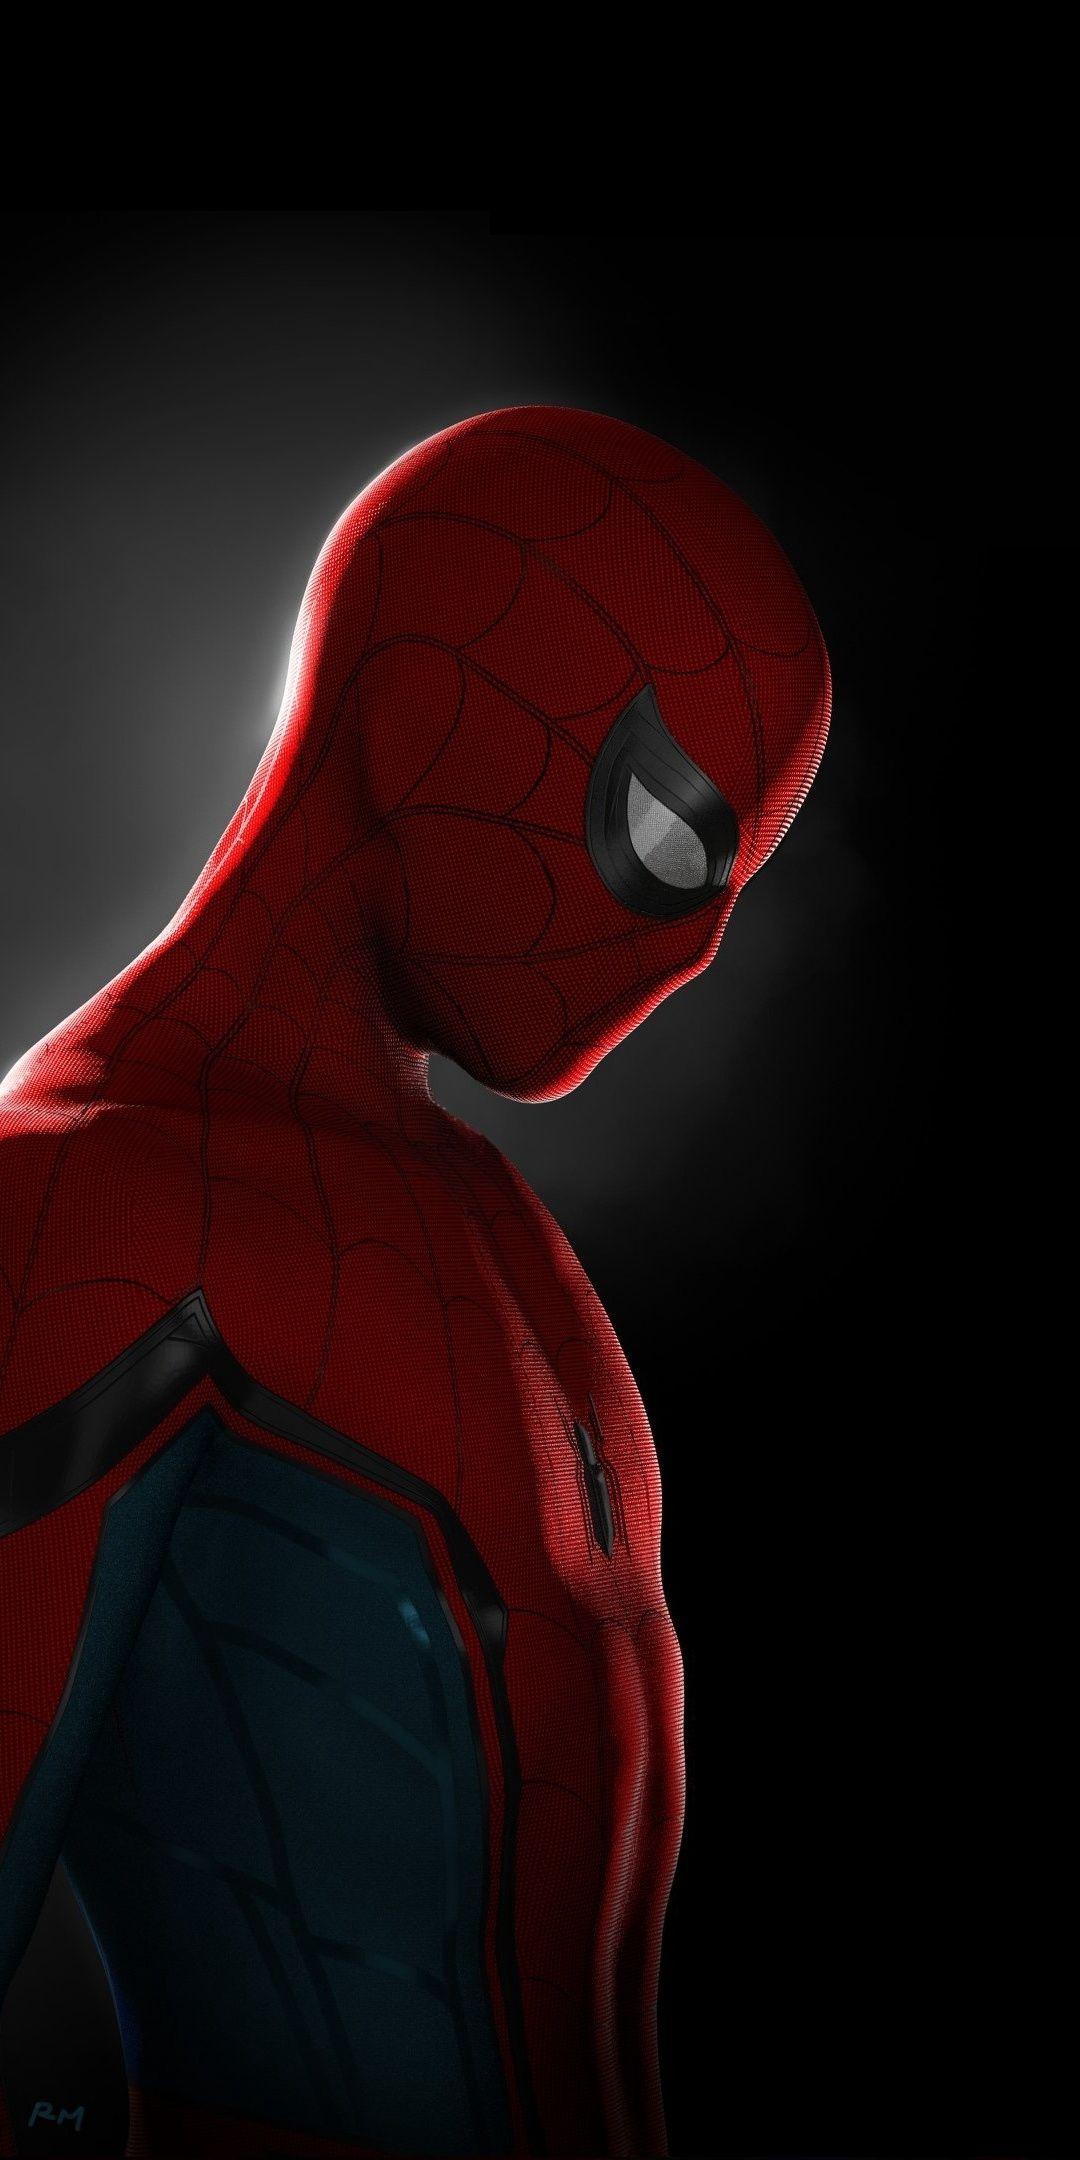 Spider Man Superhero Minimal Artwork 1080x2160 Wallpaper Superhero Wallpaper Marvel Comics Wallpaper Spiderman